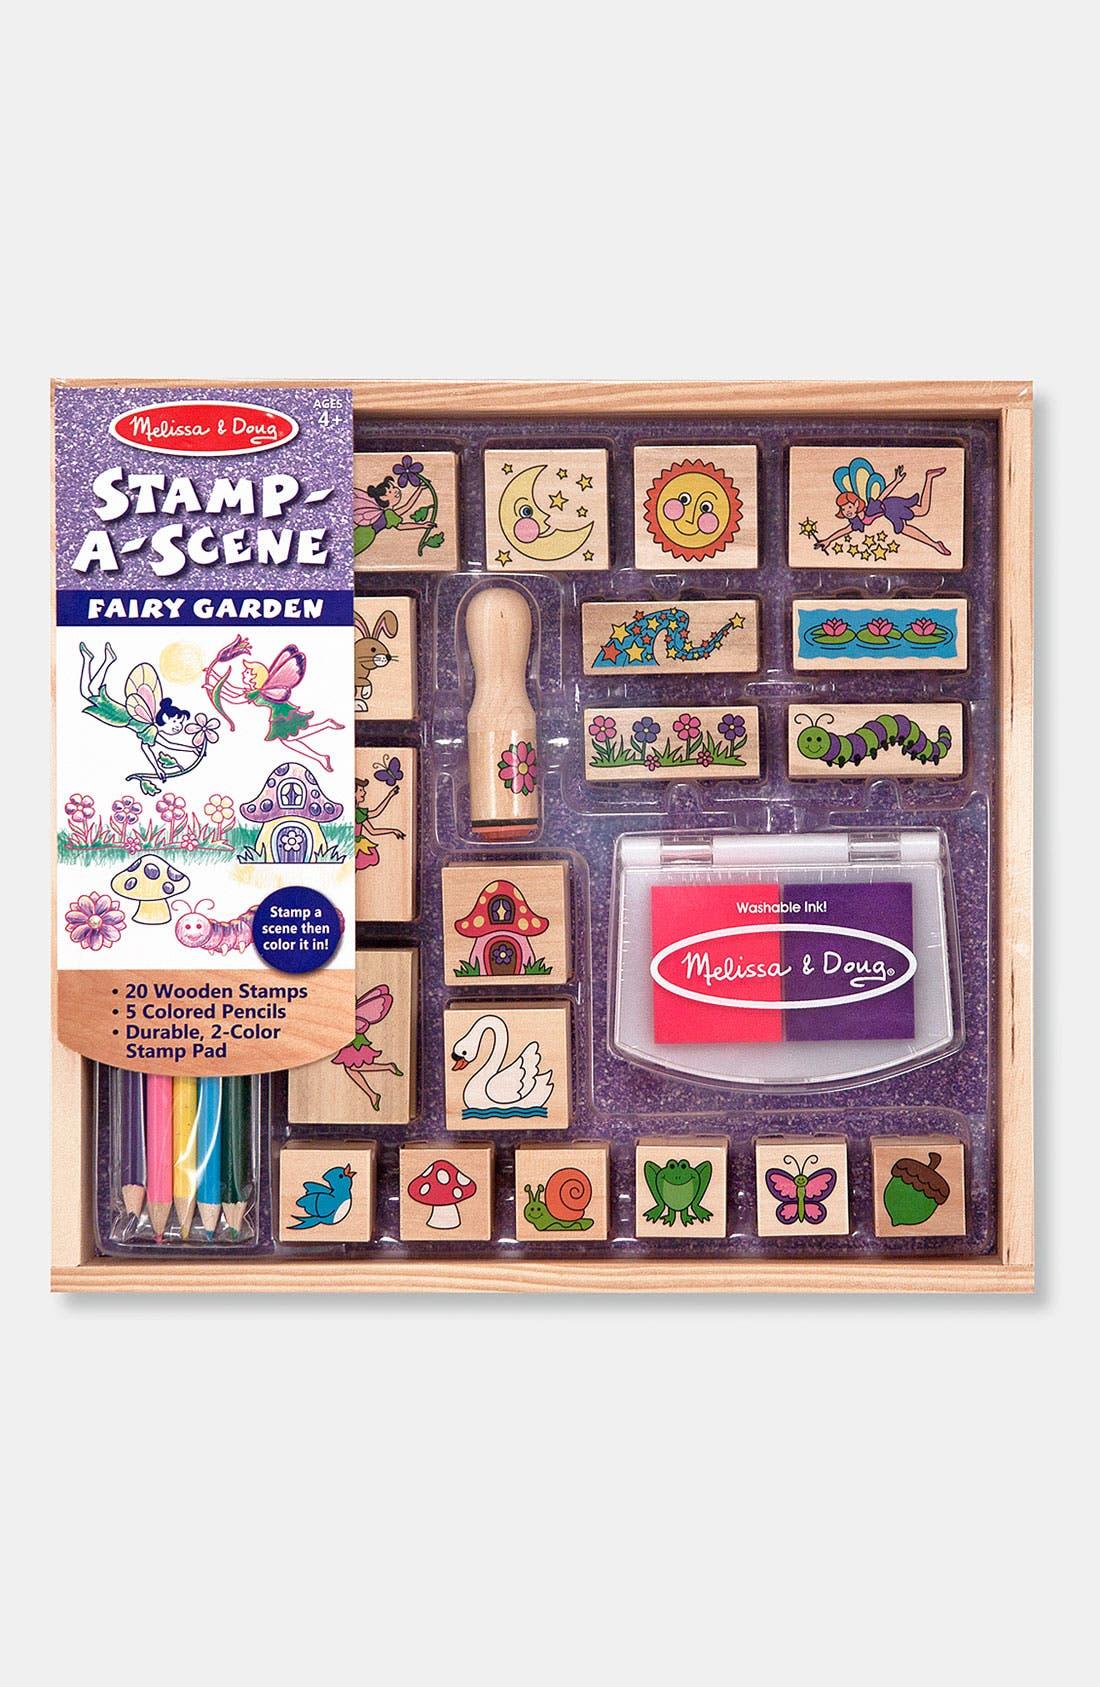 Alternate Image 1 Selected - Melissa & Doug 'Stamp-A-Scene - Fairy Garden' Stamp Set